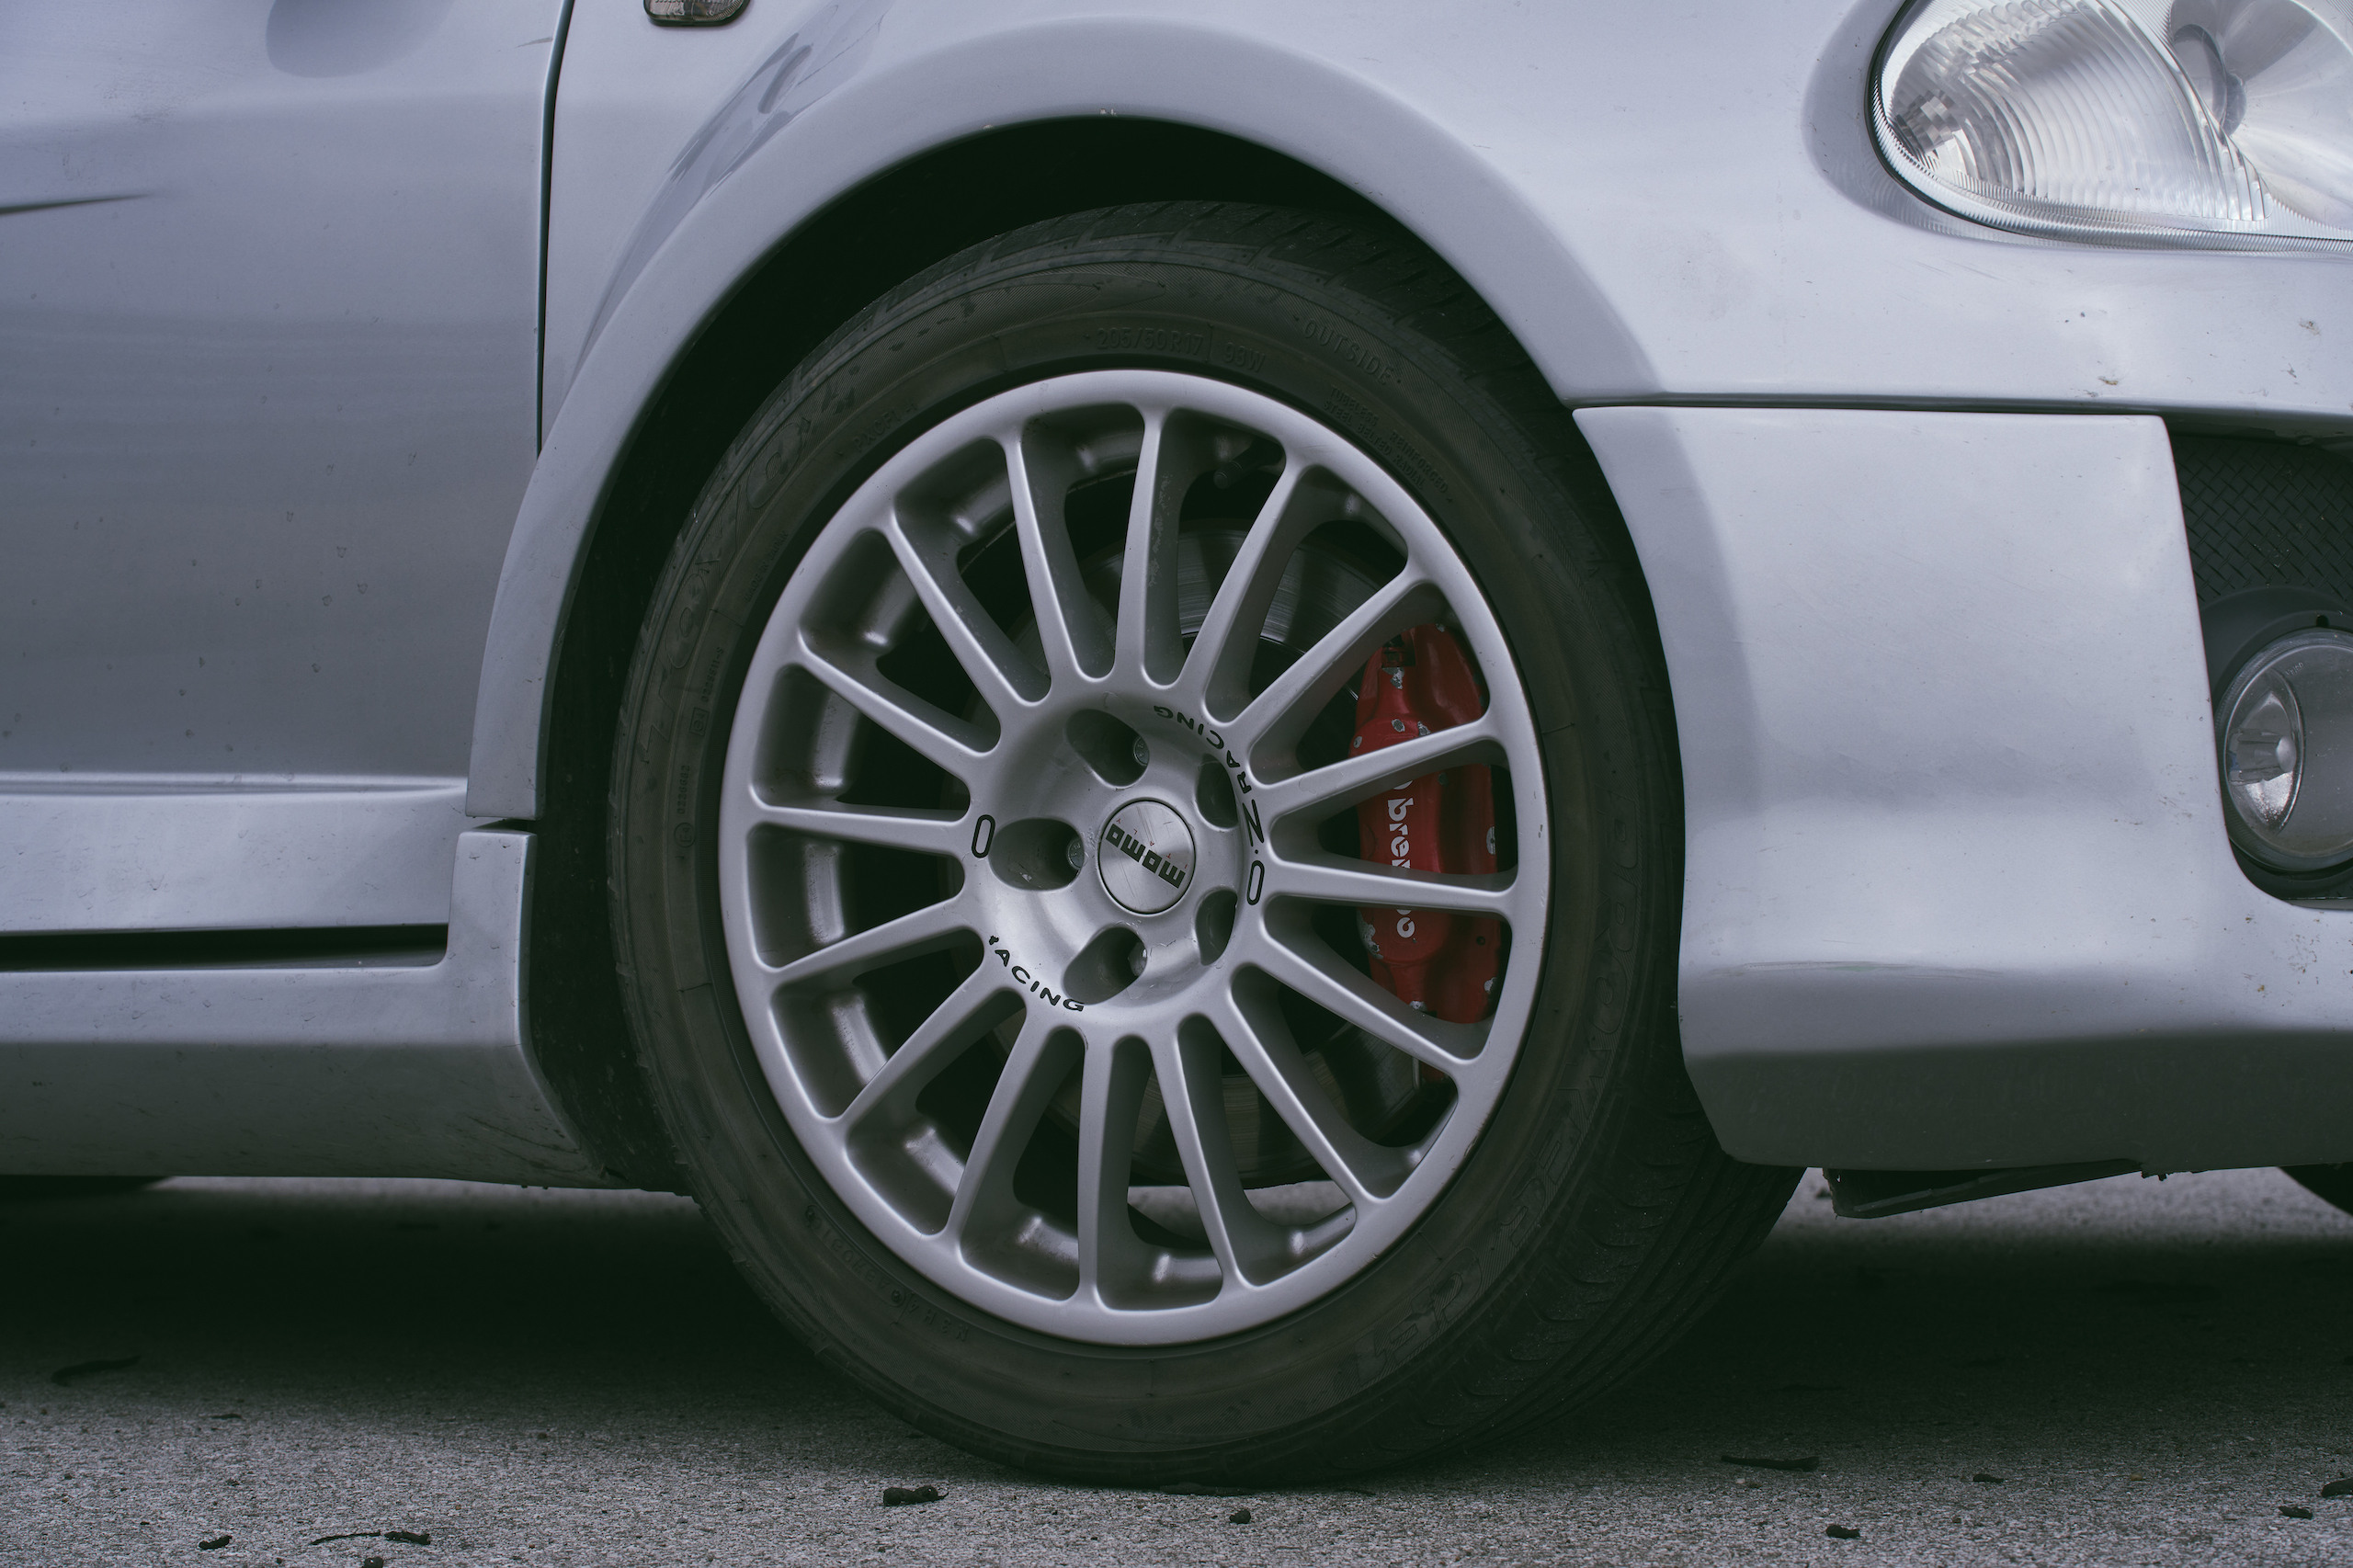 2002 Renault Clio V6 front wheel